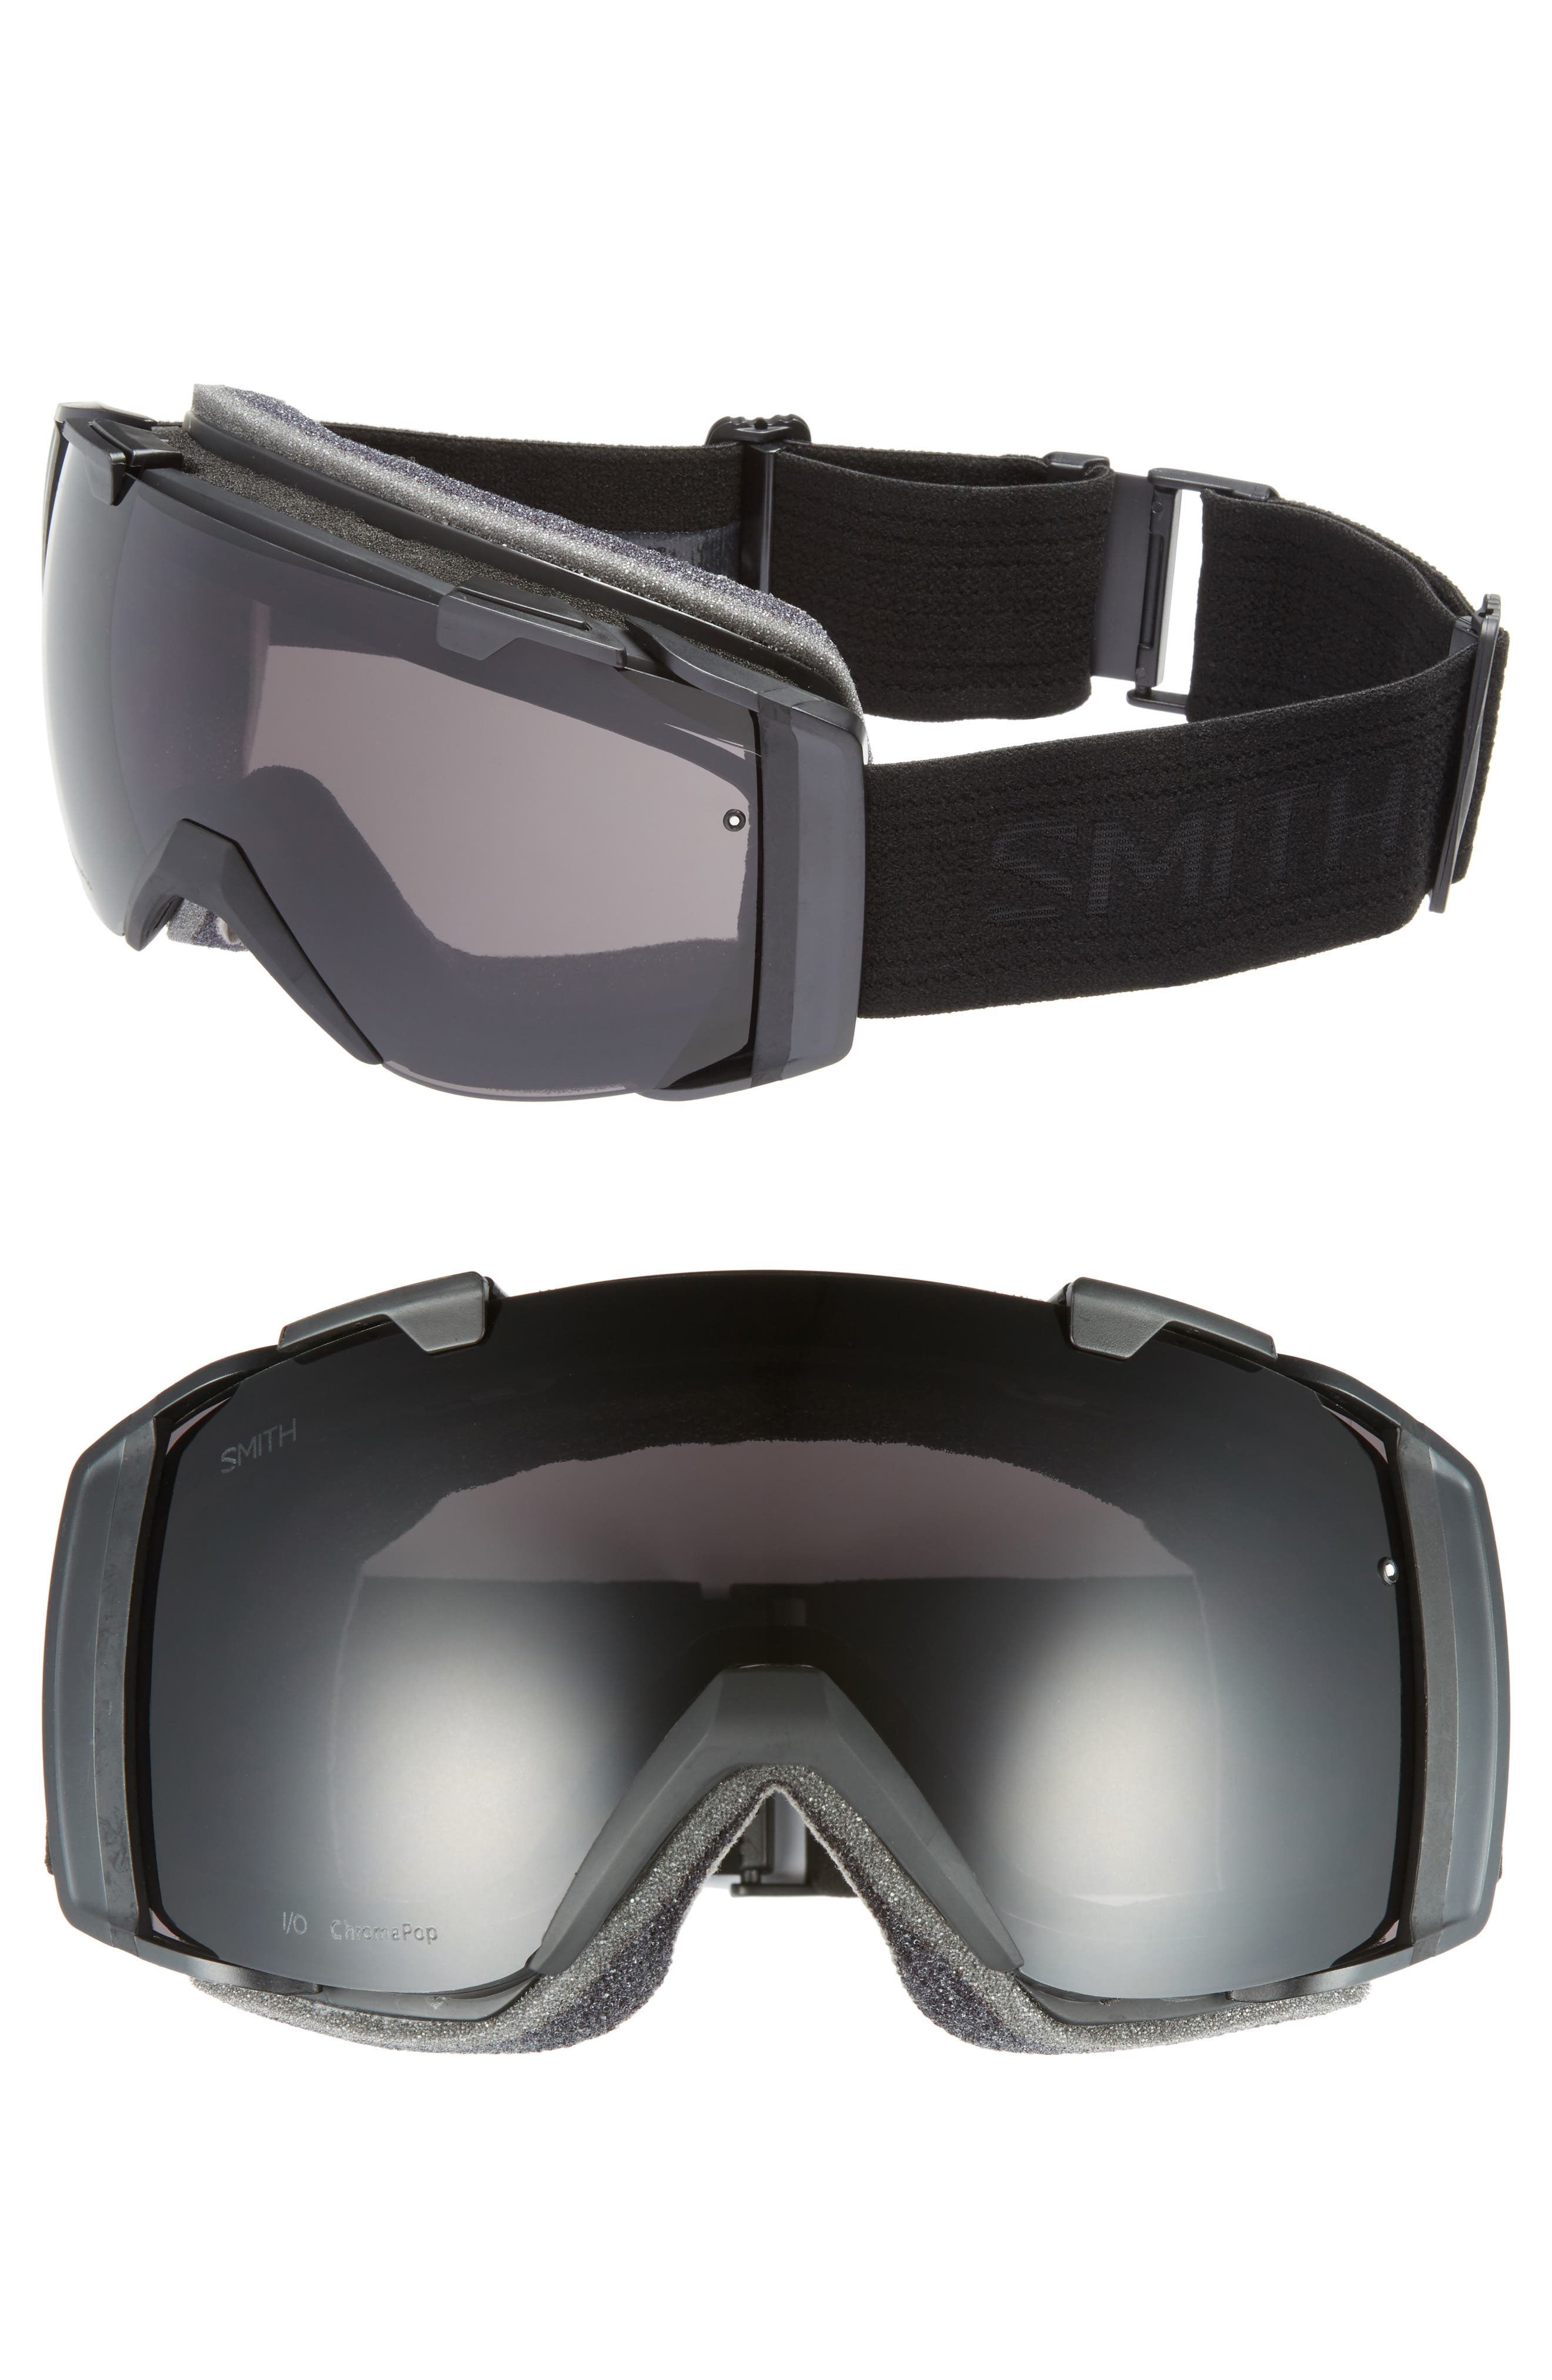 I/O 185mm Snow/Ski Goggles,                         Main,                         color, BLACKOUT/ MIRROR